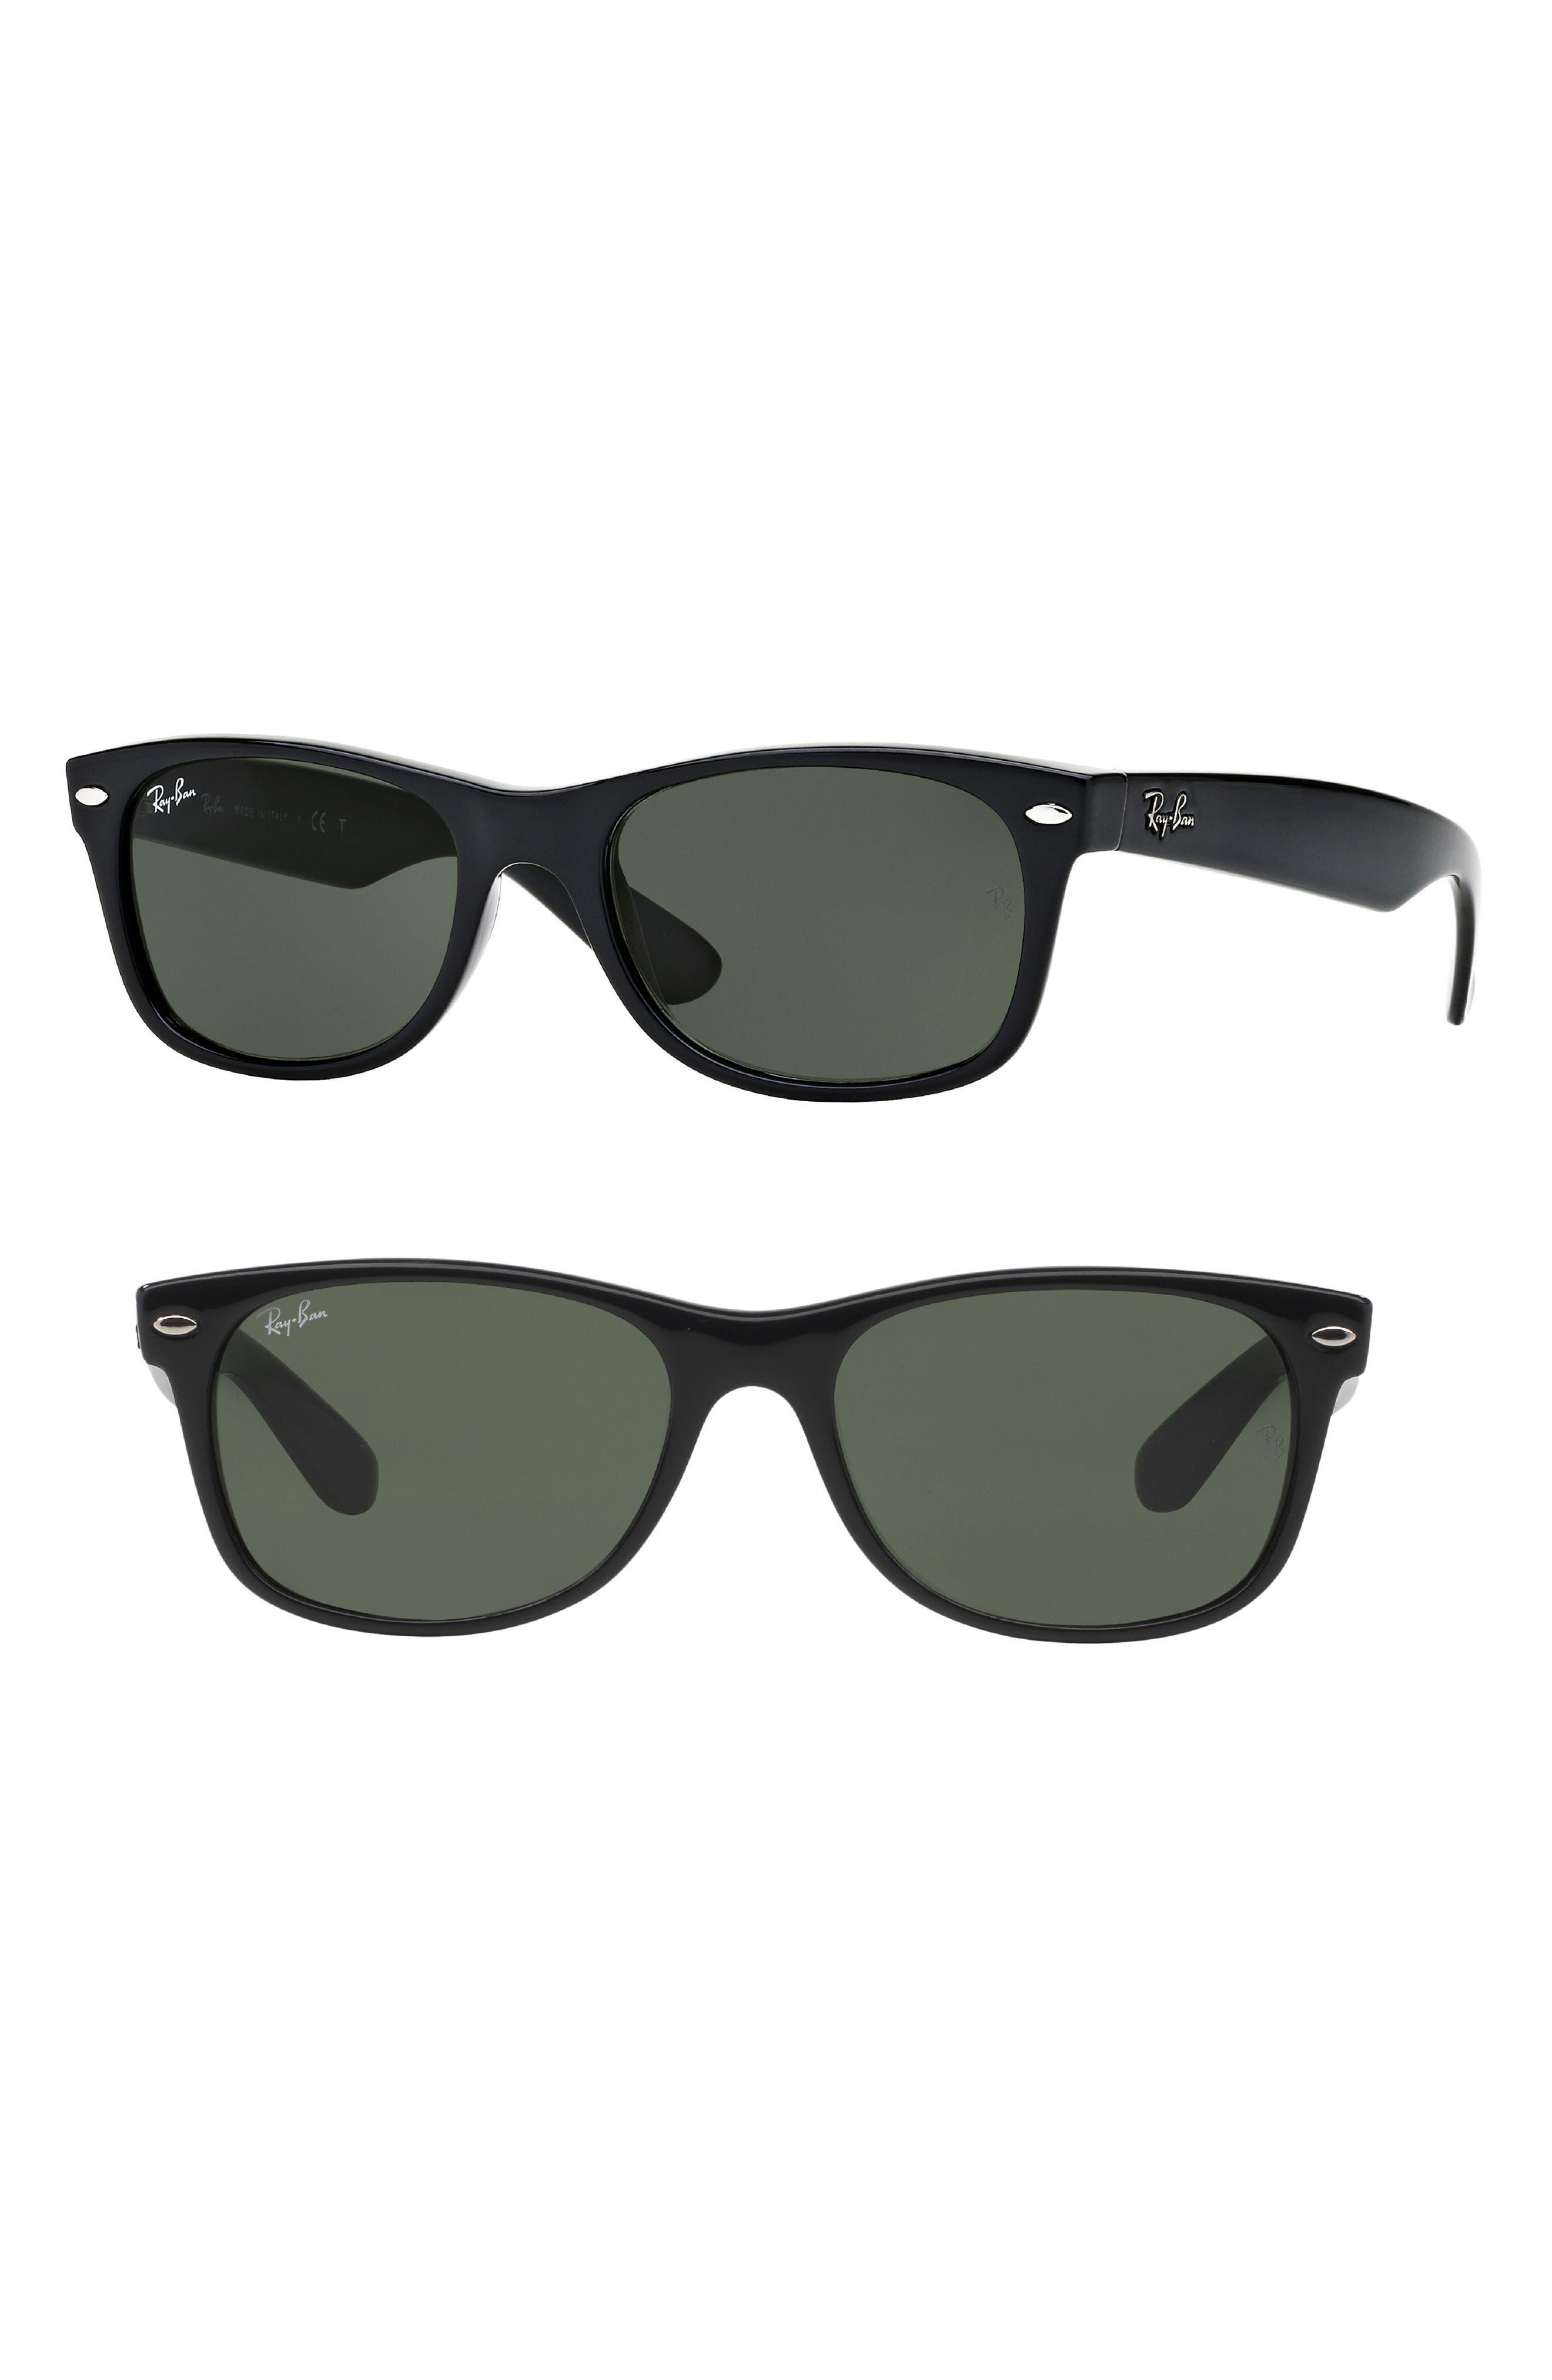 Main Image - Ray-Ban Standard New Wayfarer 55mm Sunglasses